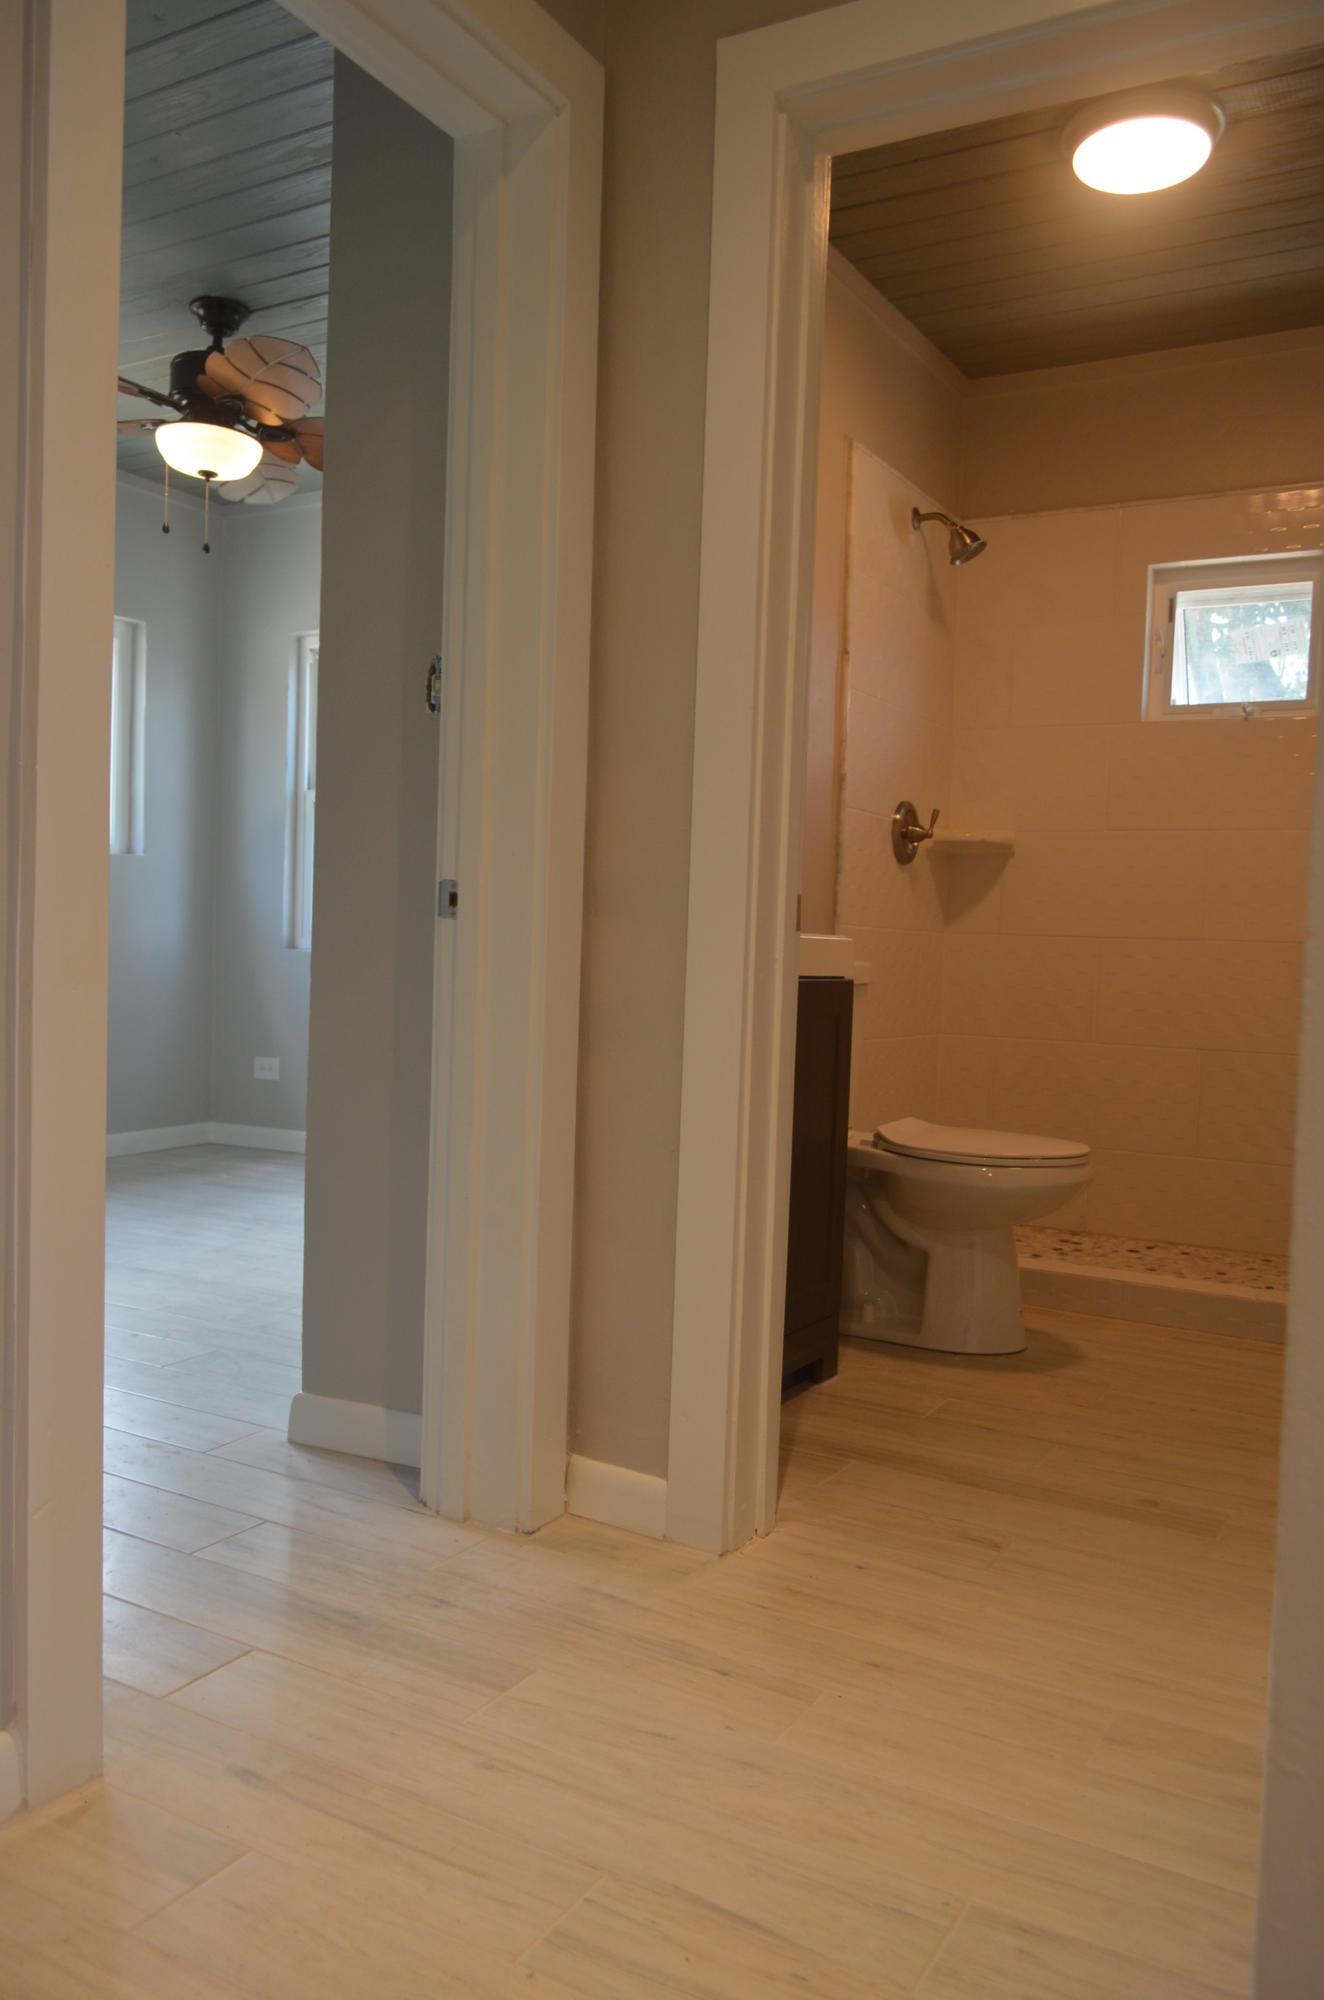 Hall to Bedroom & Main Bath